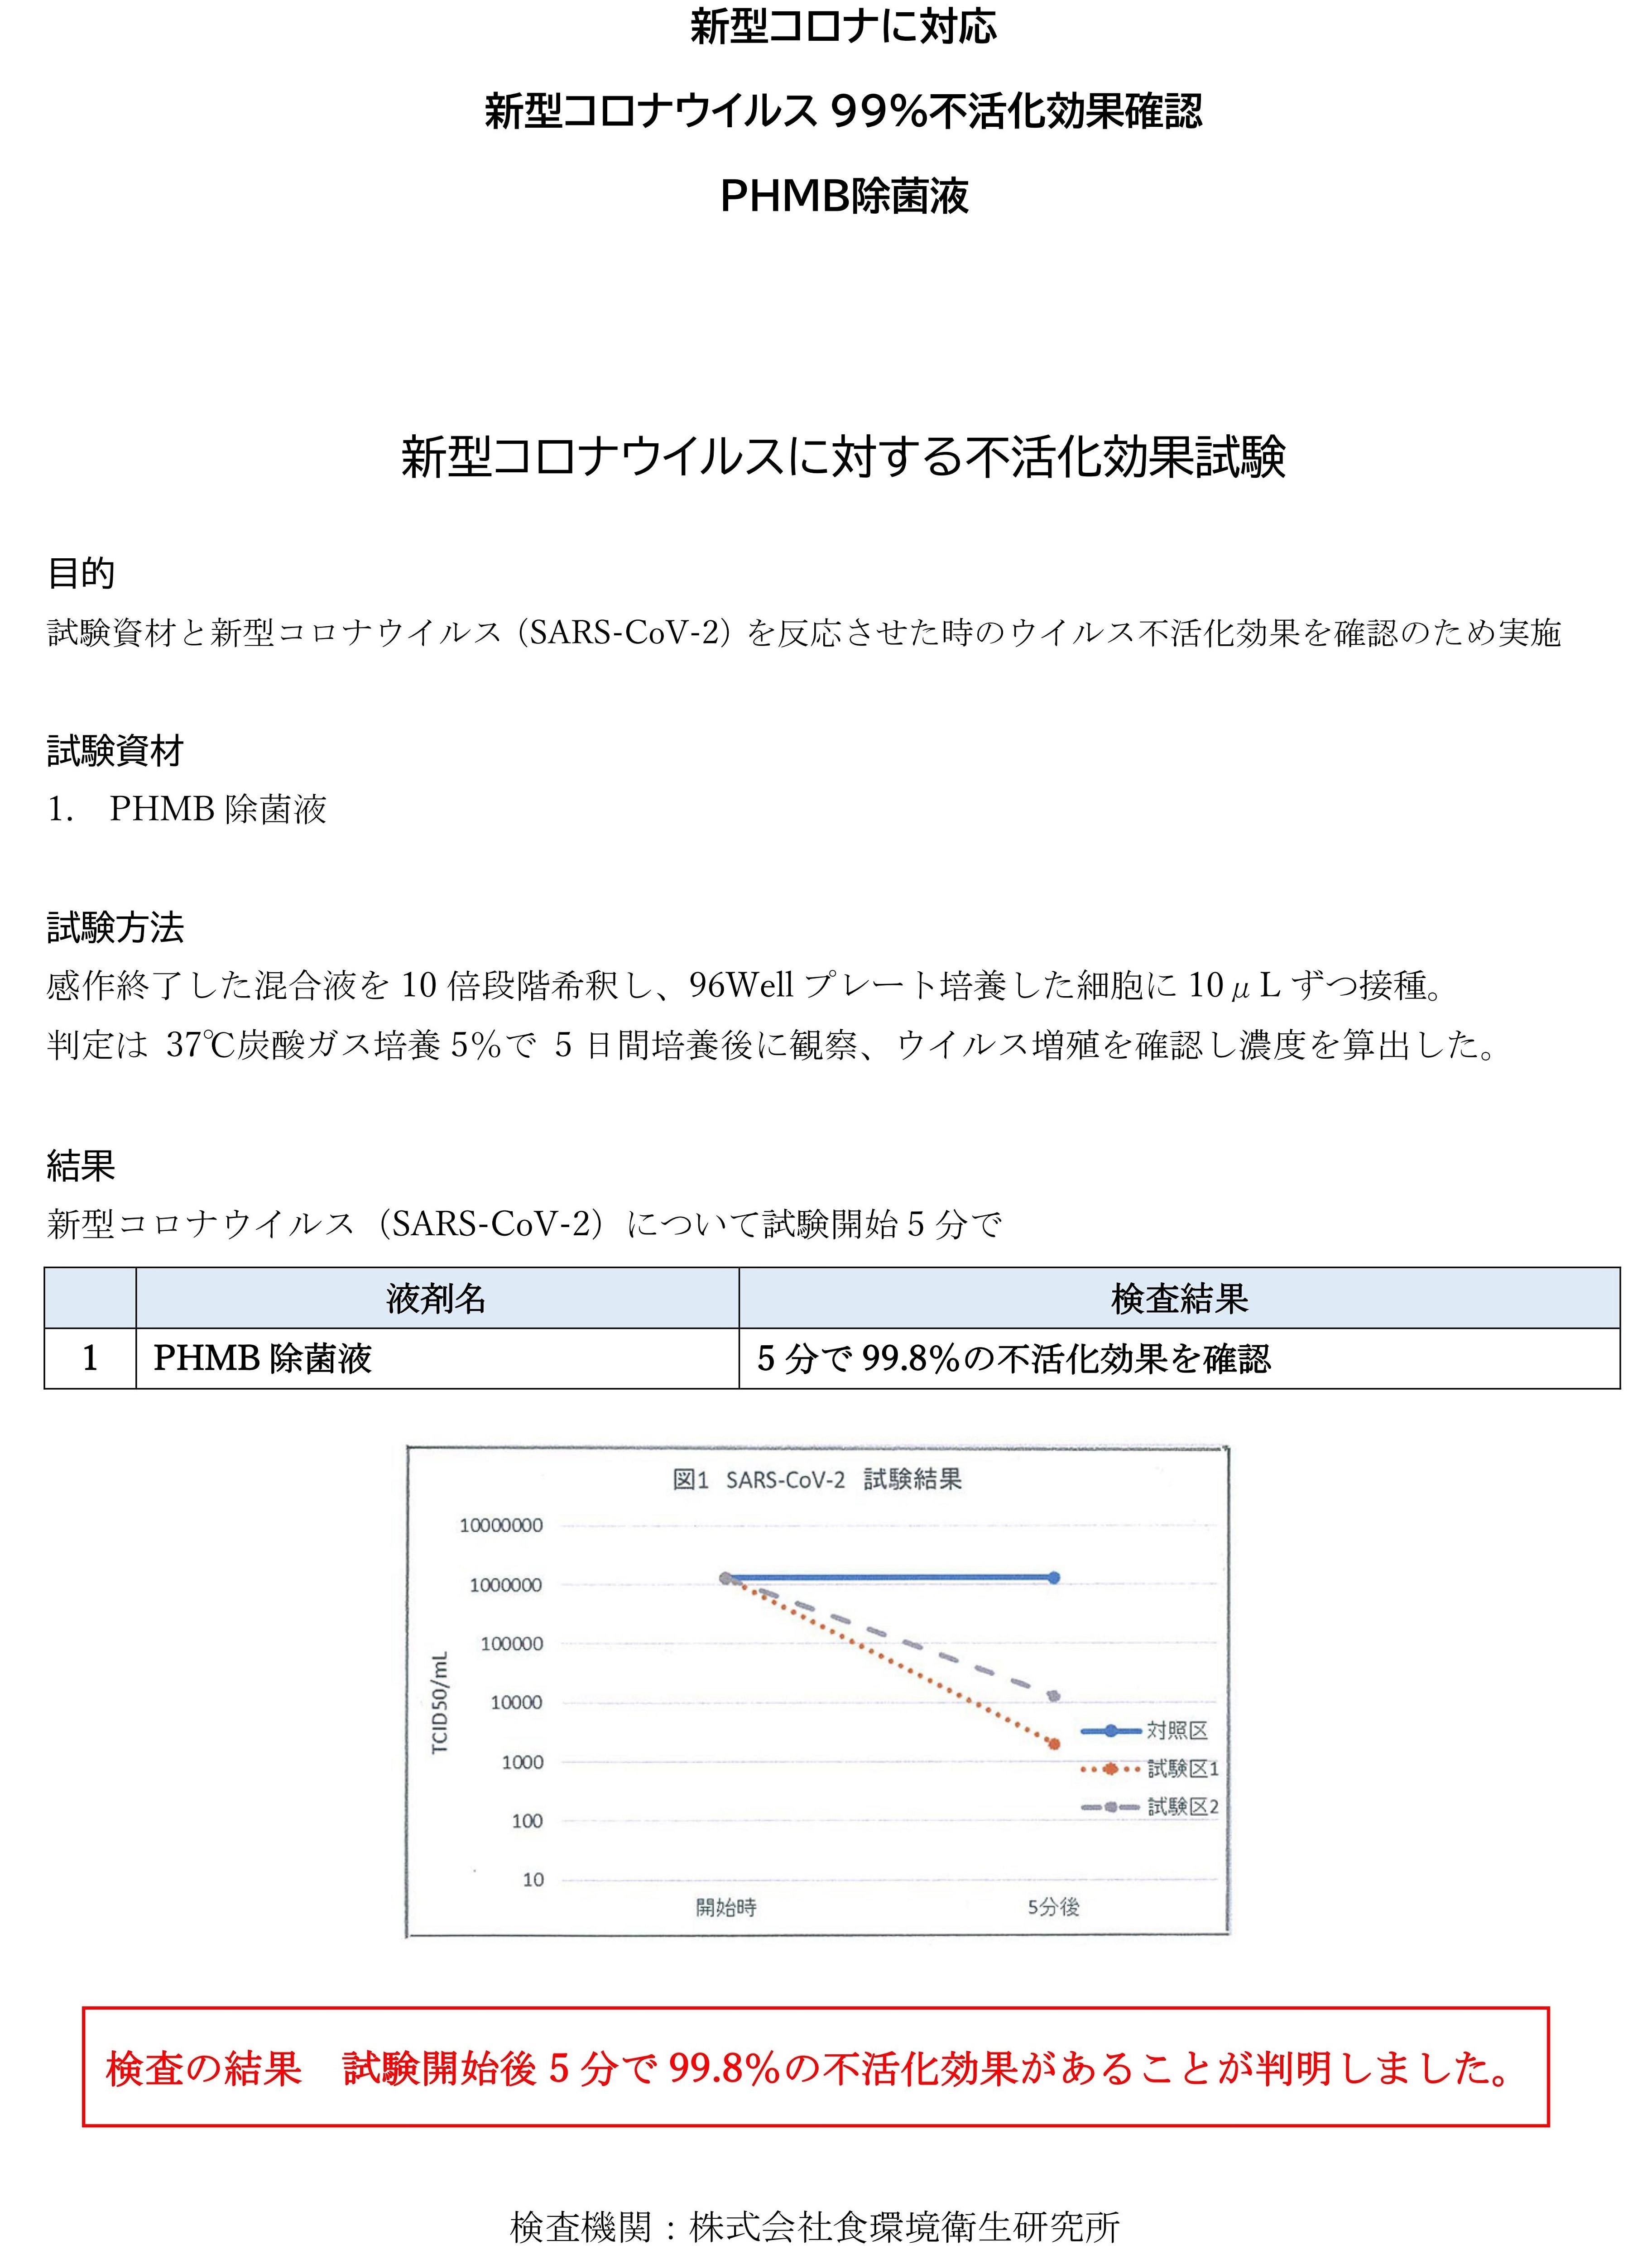 PHMB検査結果.jpg